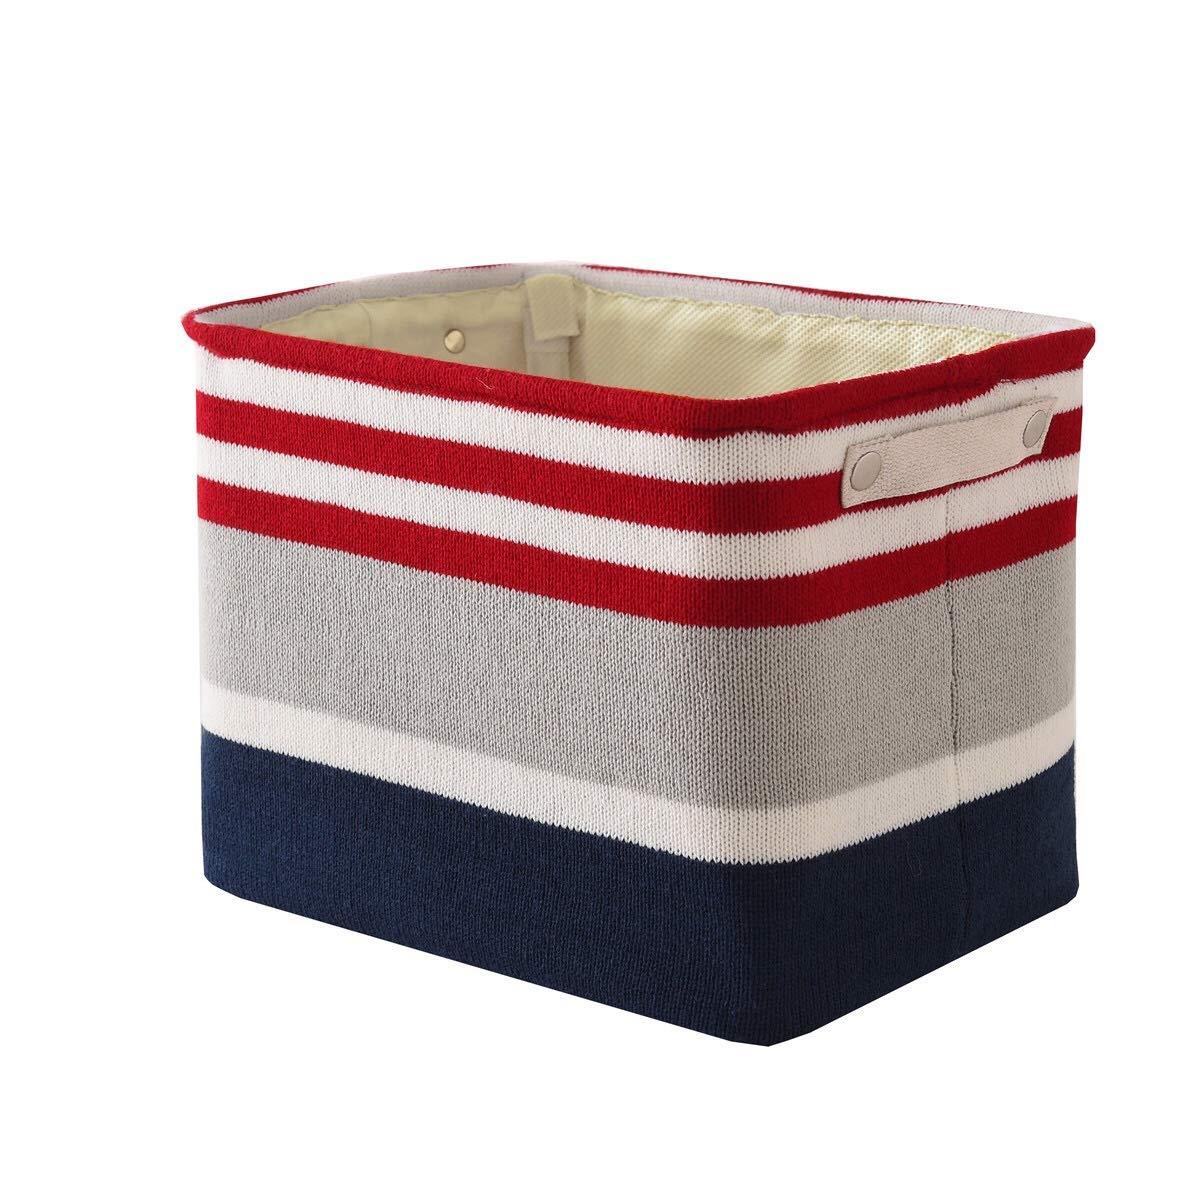 Stripe Decorative Basket Rectangular Fabric Storage Bin Organizer With Handles 16 L 12 W H